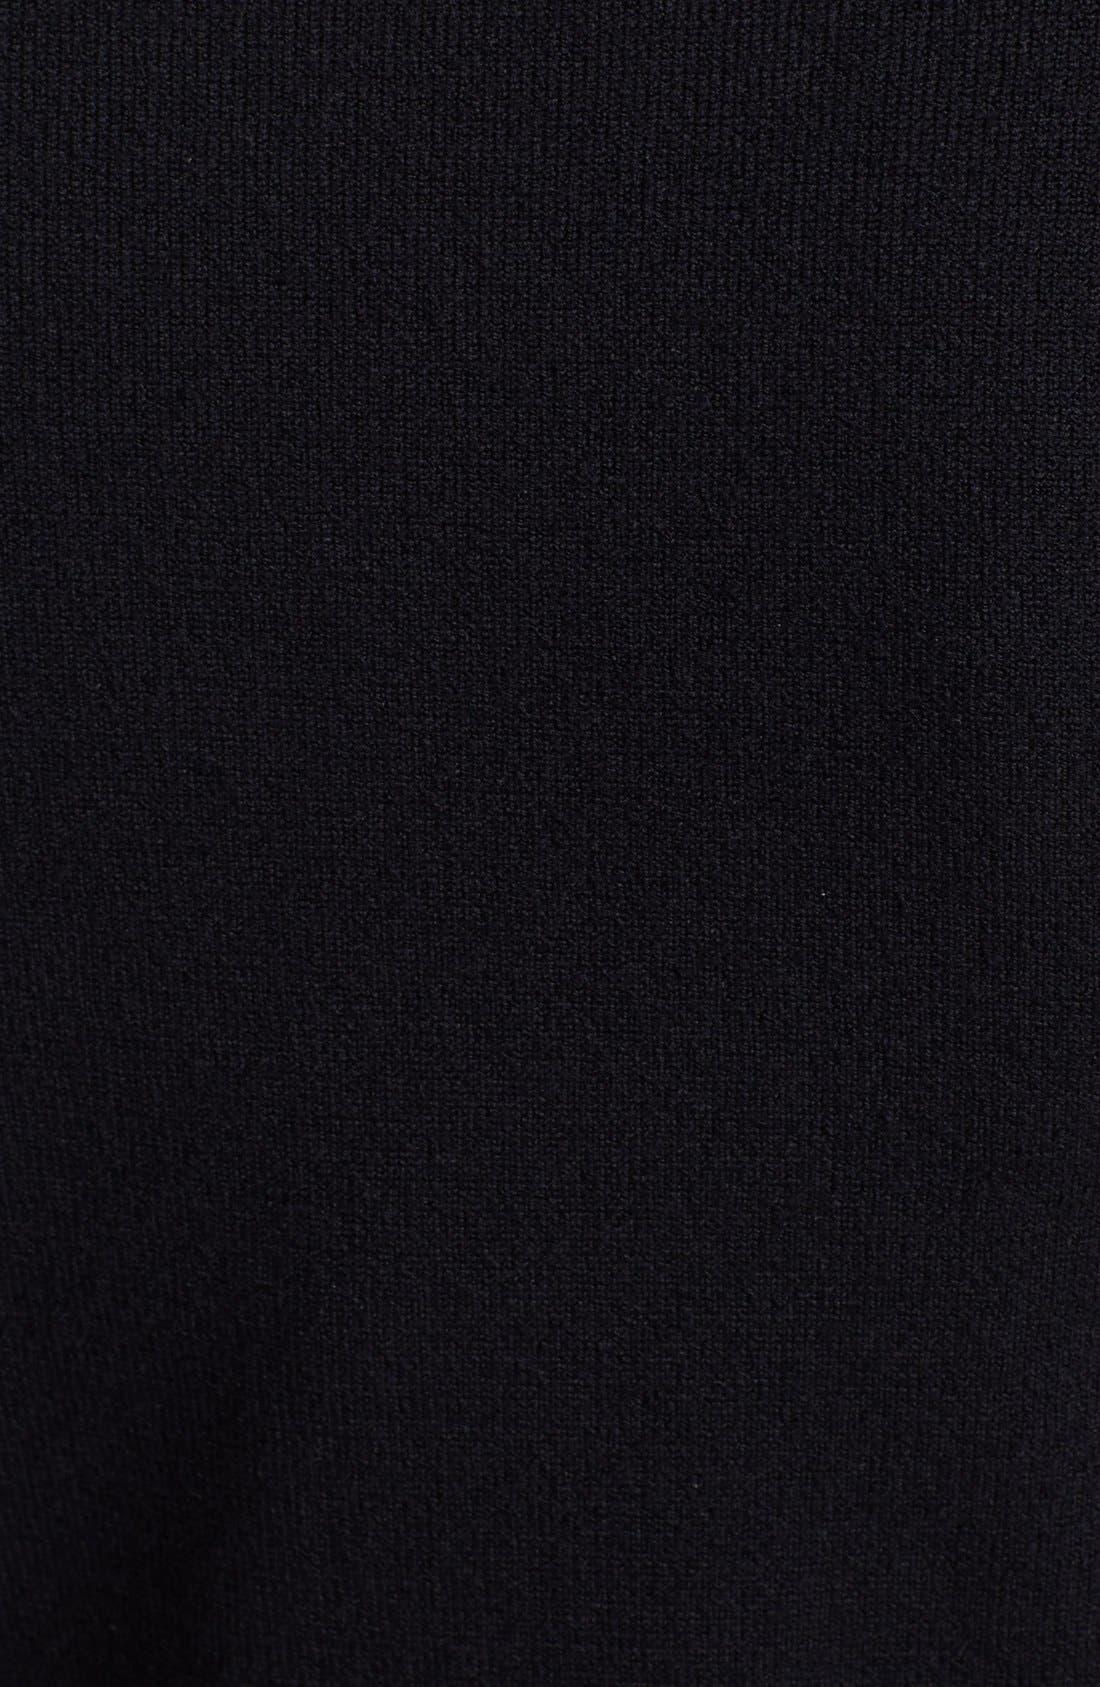 Alternate Image 3  - Alice + Olivia 'Wiley' Contrast Trim Sweater